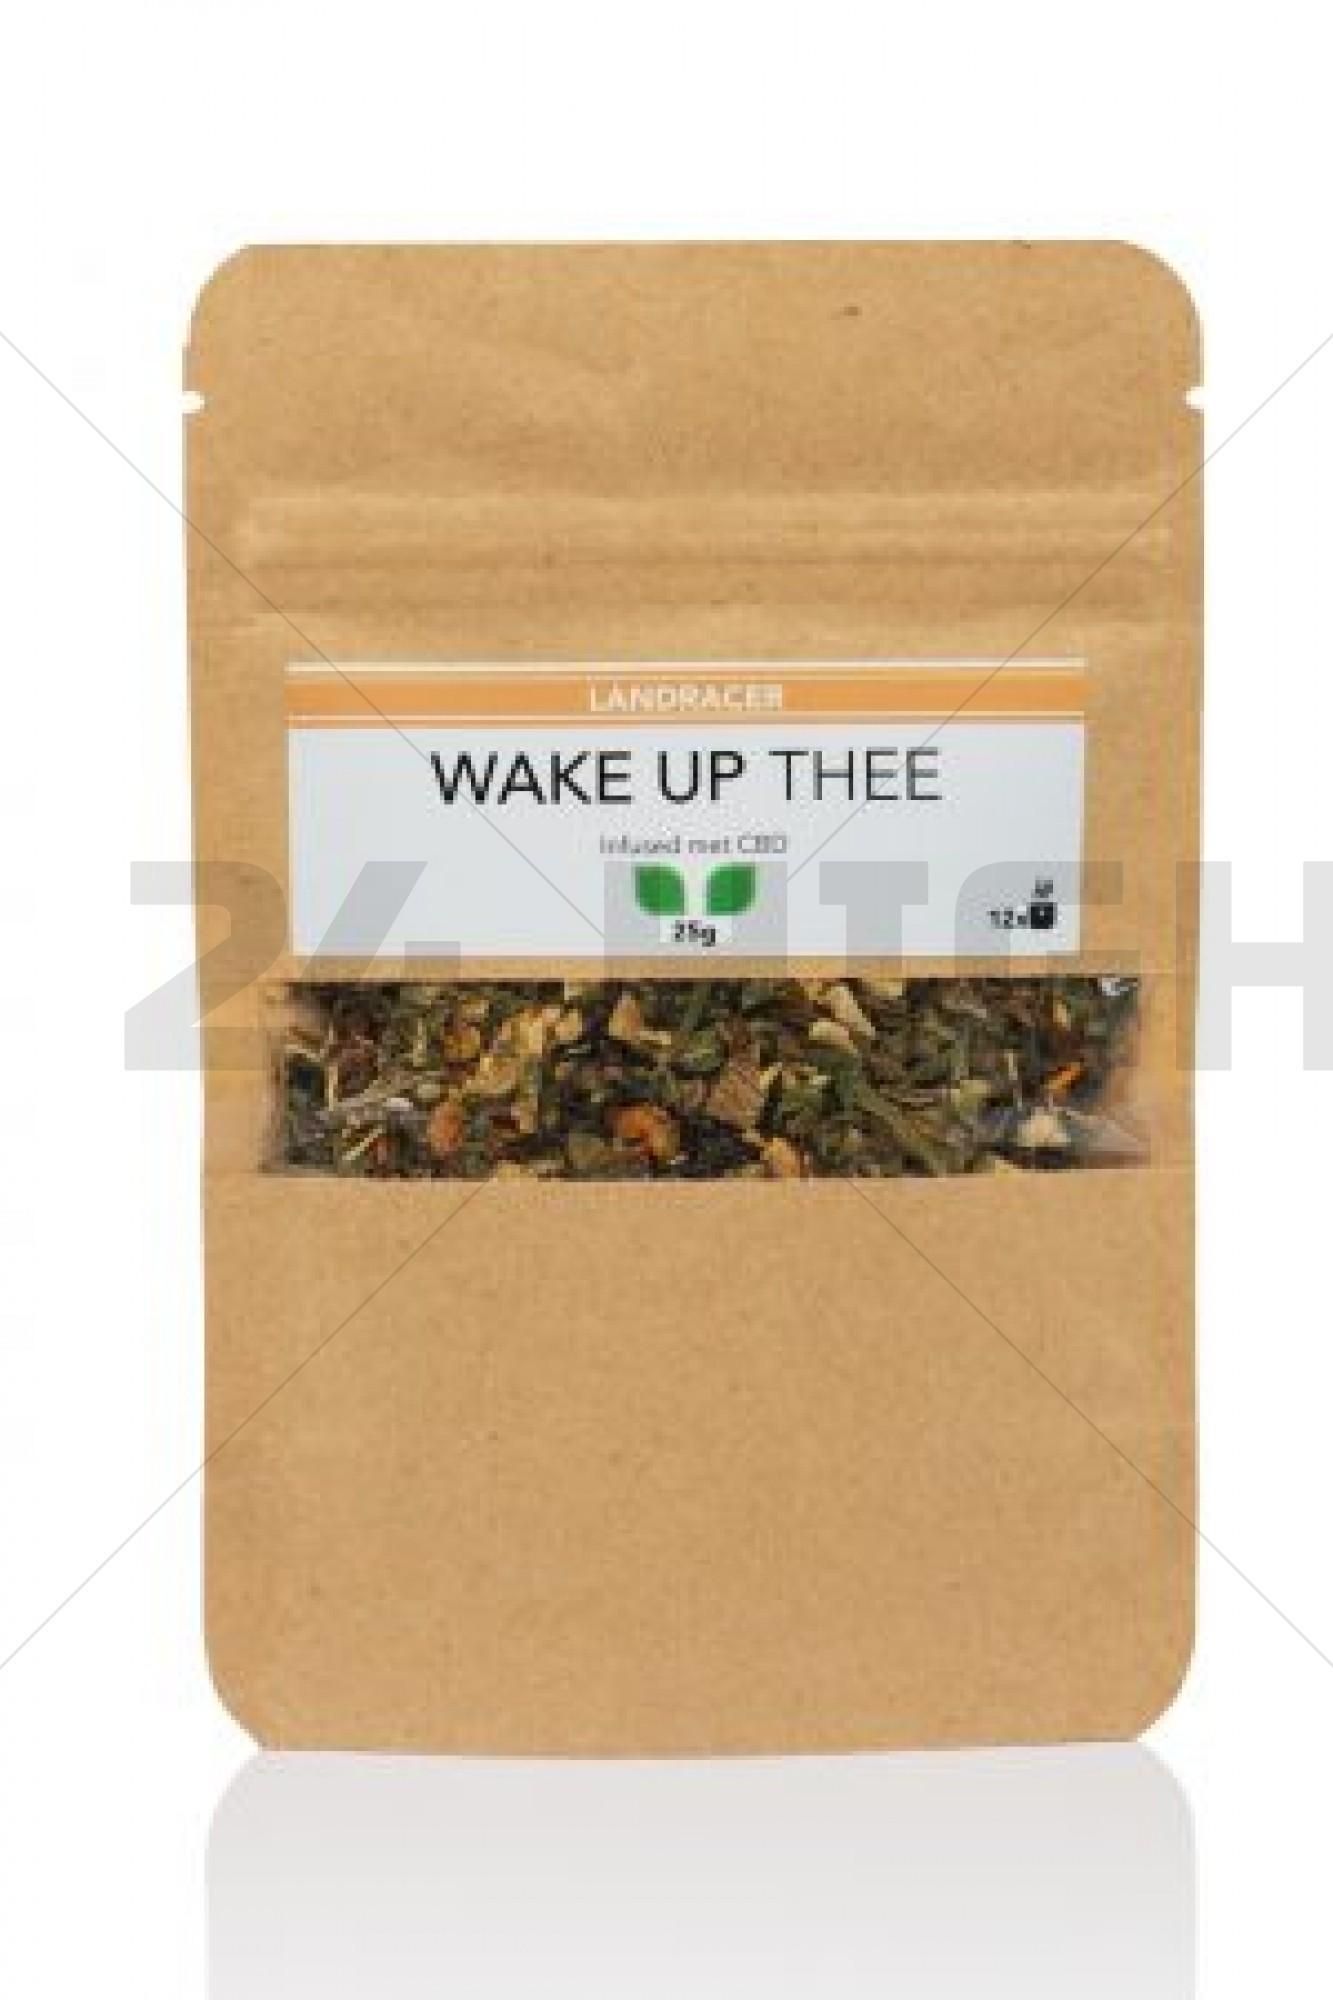 The Landracer wake up tea infused with cannabidiol.